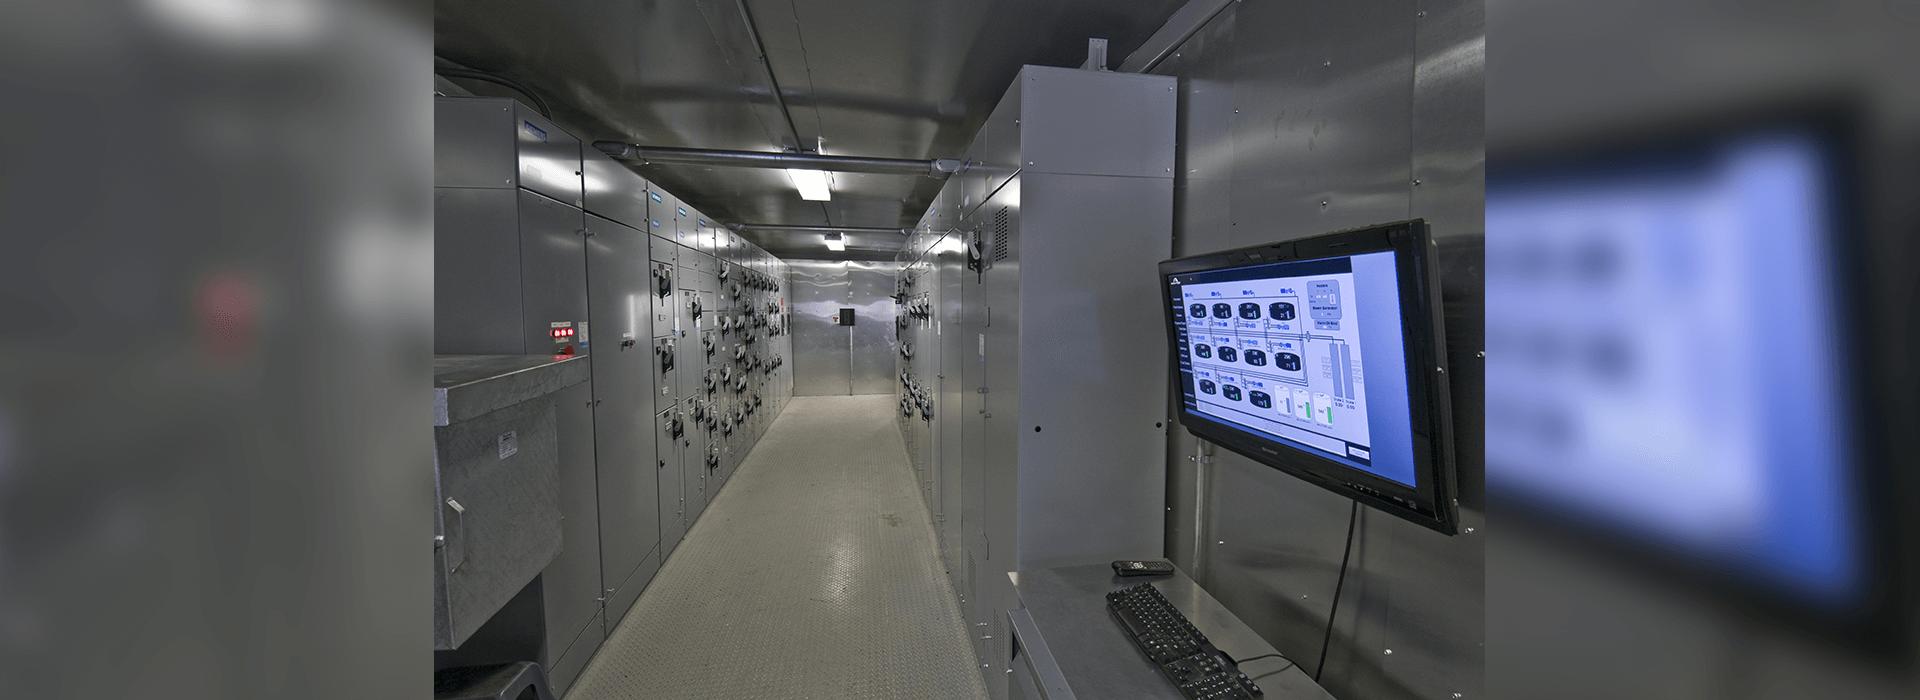 Heatec Motor Control System